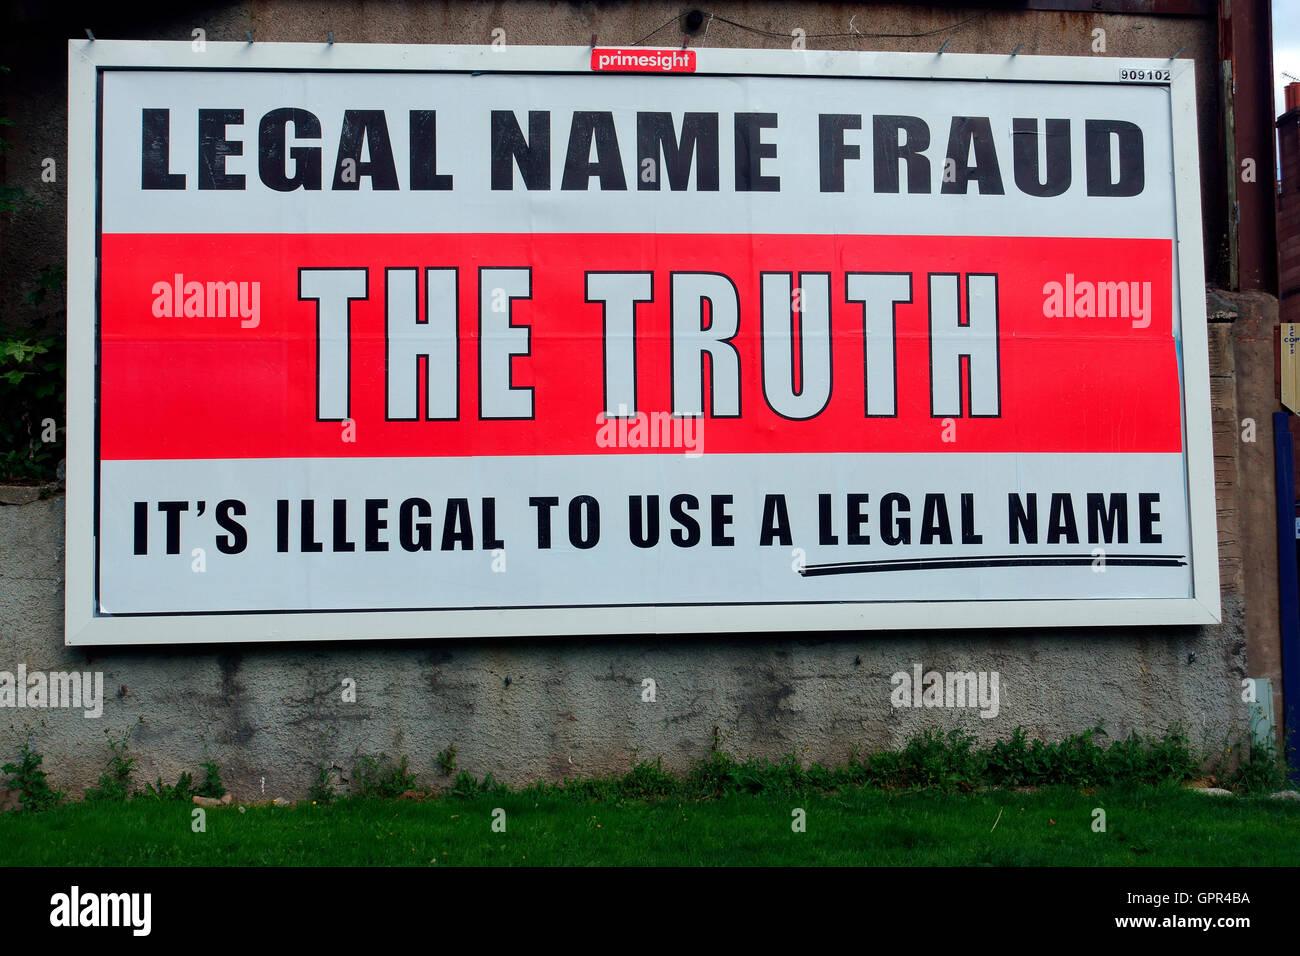 Legal Name Fraud billboard advertising in Paisley Scotland UK - Stock Image